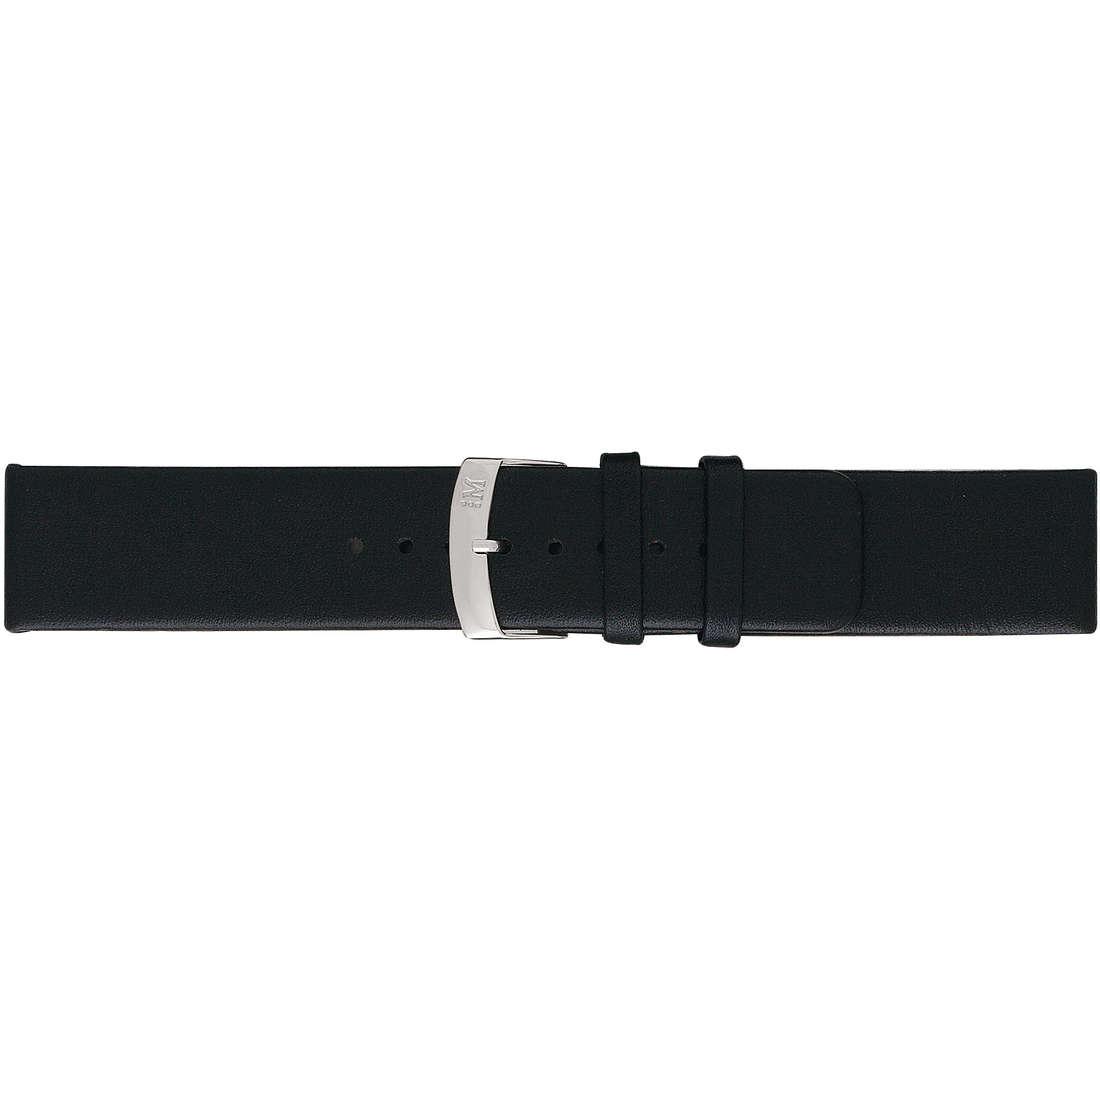 watch watch bands watch straps man Morellato Morellato 1930 A01X3076875019CR28